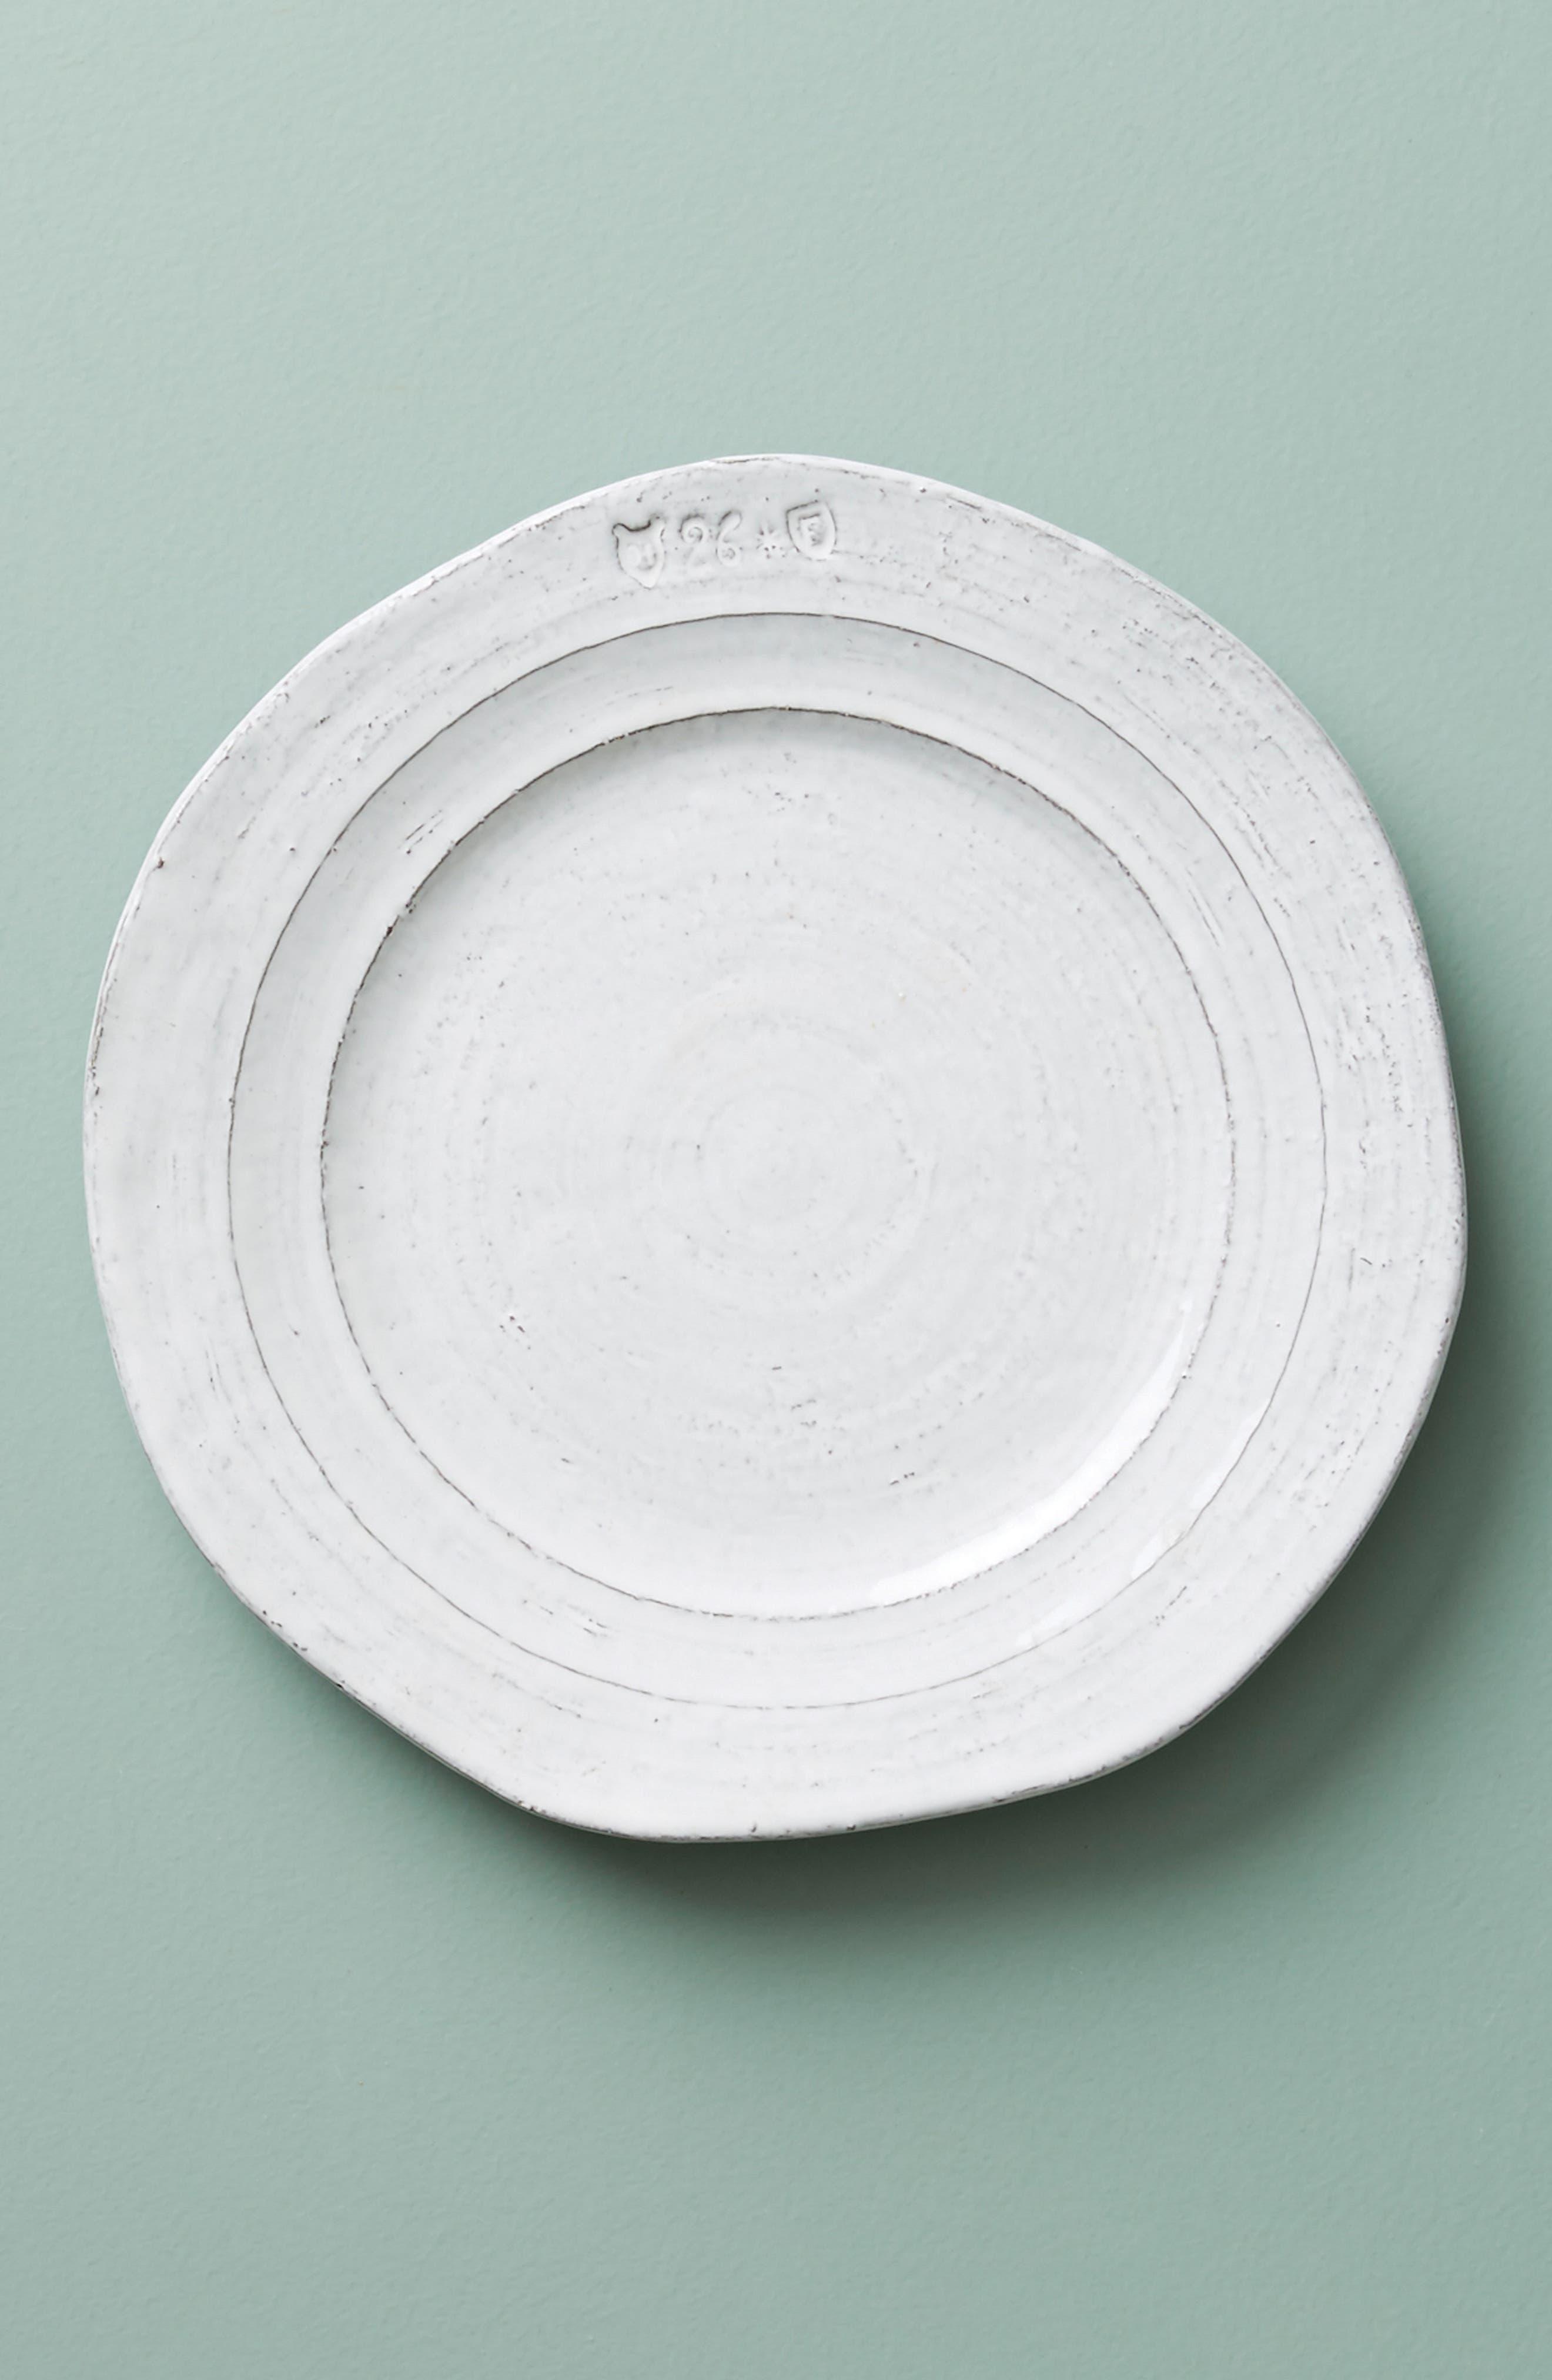 Anthropologie Glenna Side Plate & White Appetizer \u0026 Dessert Plates Dinnerware: Dishes Plates \u0026 Bowls ...